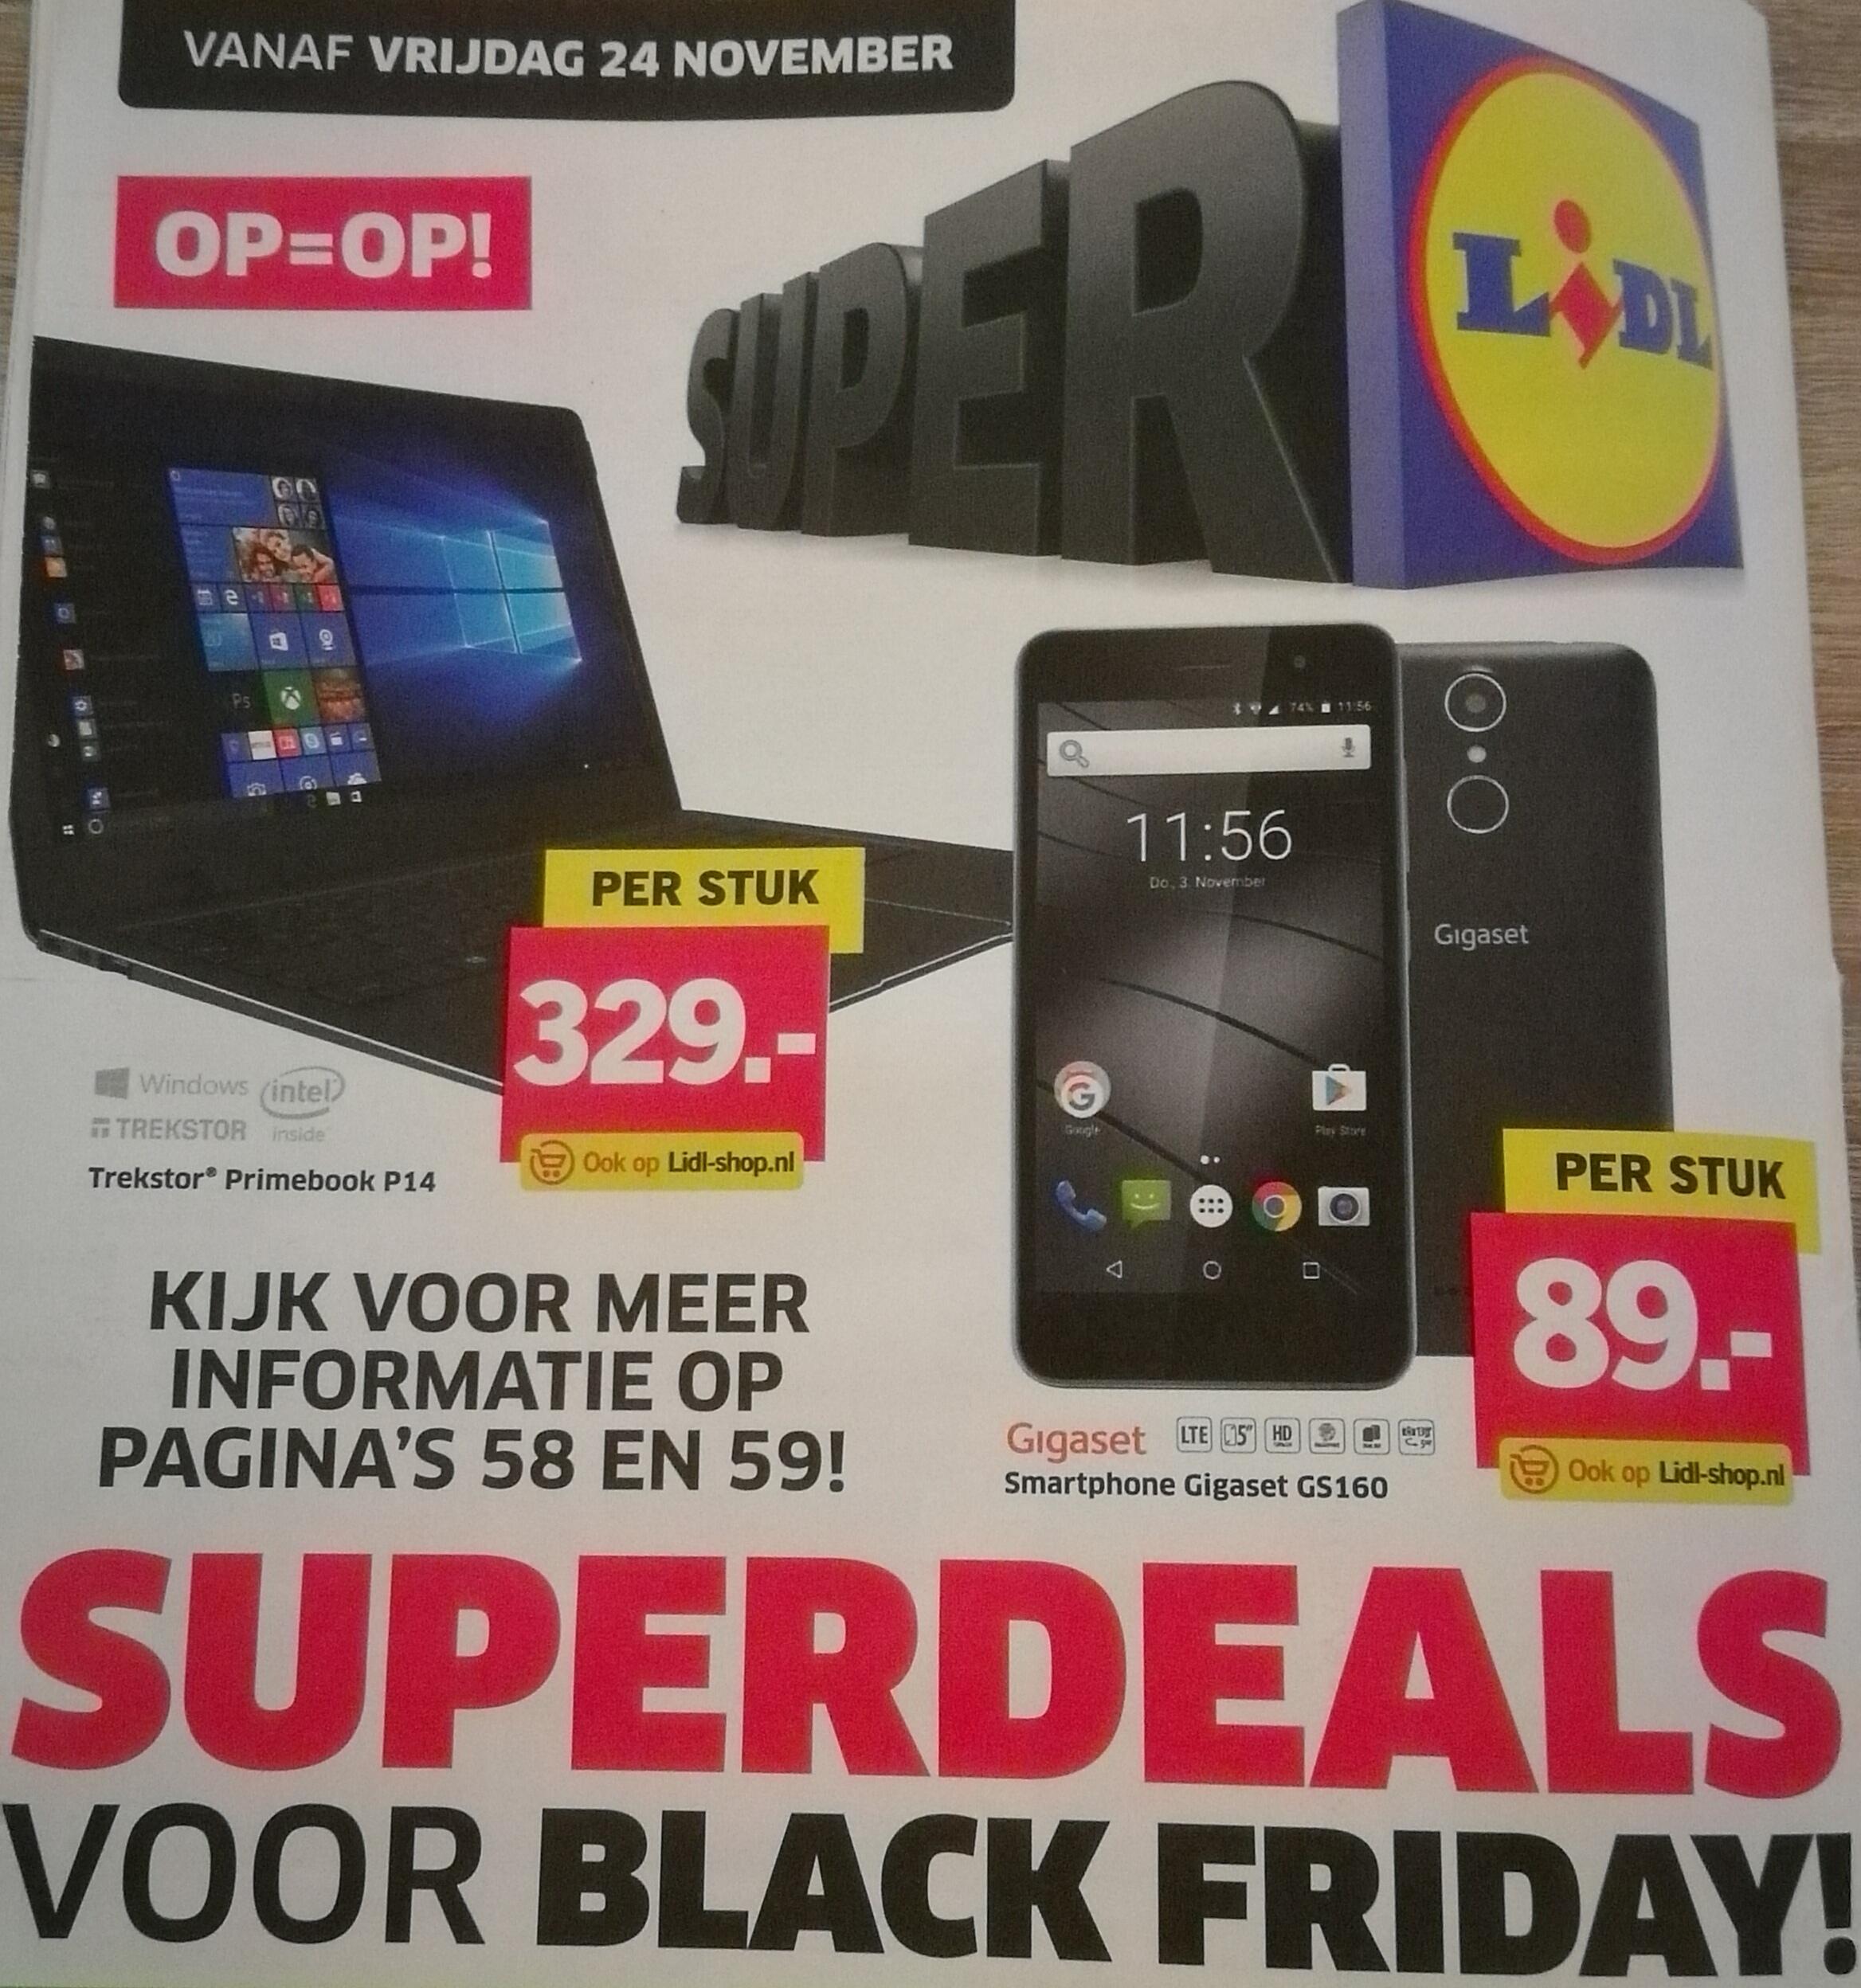 Superdeals voor Black Friday - vanaf vrijdag 24 november @ LIDL